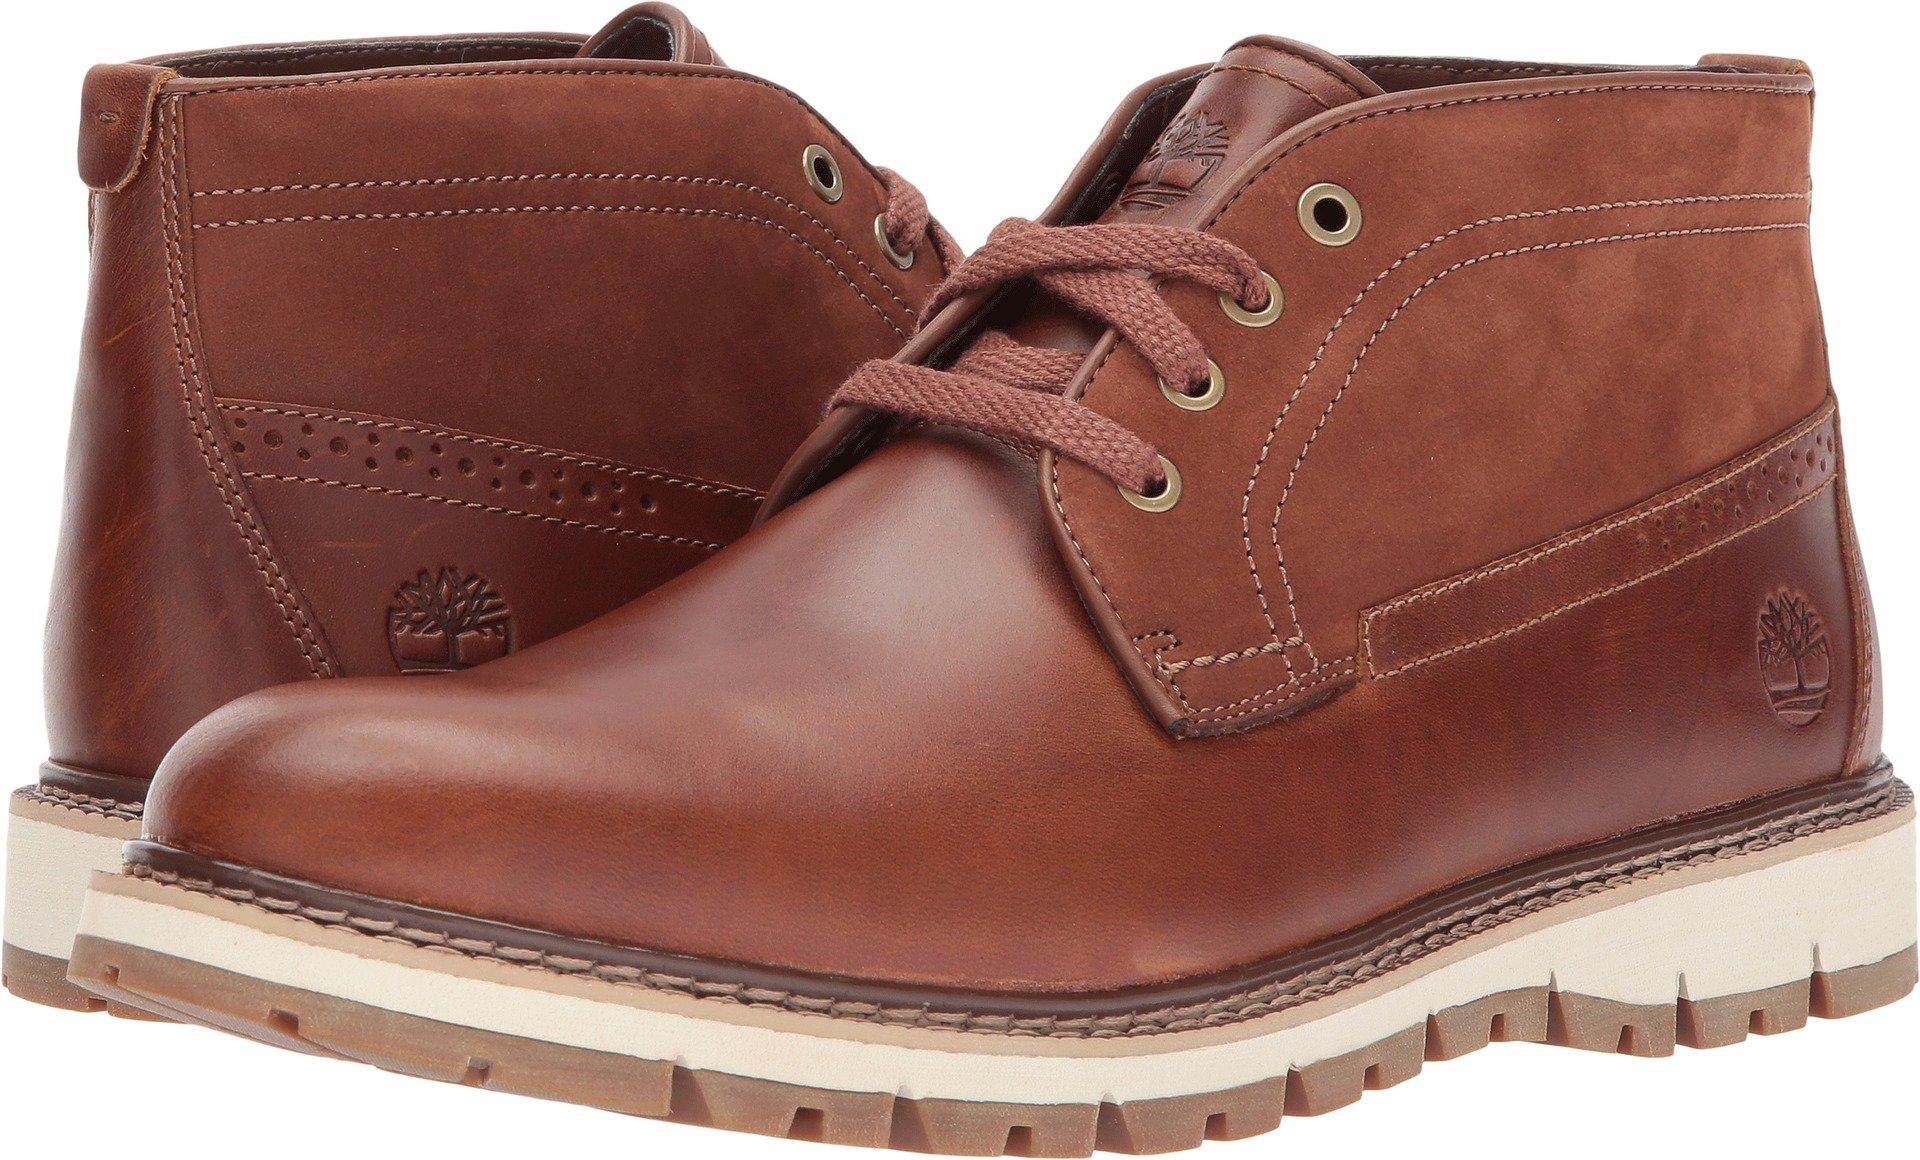 Timberland Britton Hill Chukka Boot - Men's Medium Brown Full Grain, 10.0